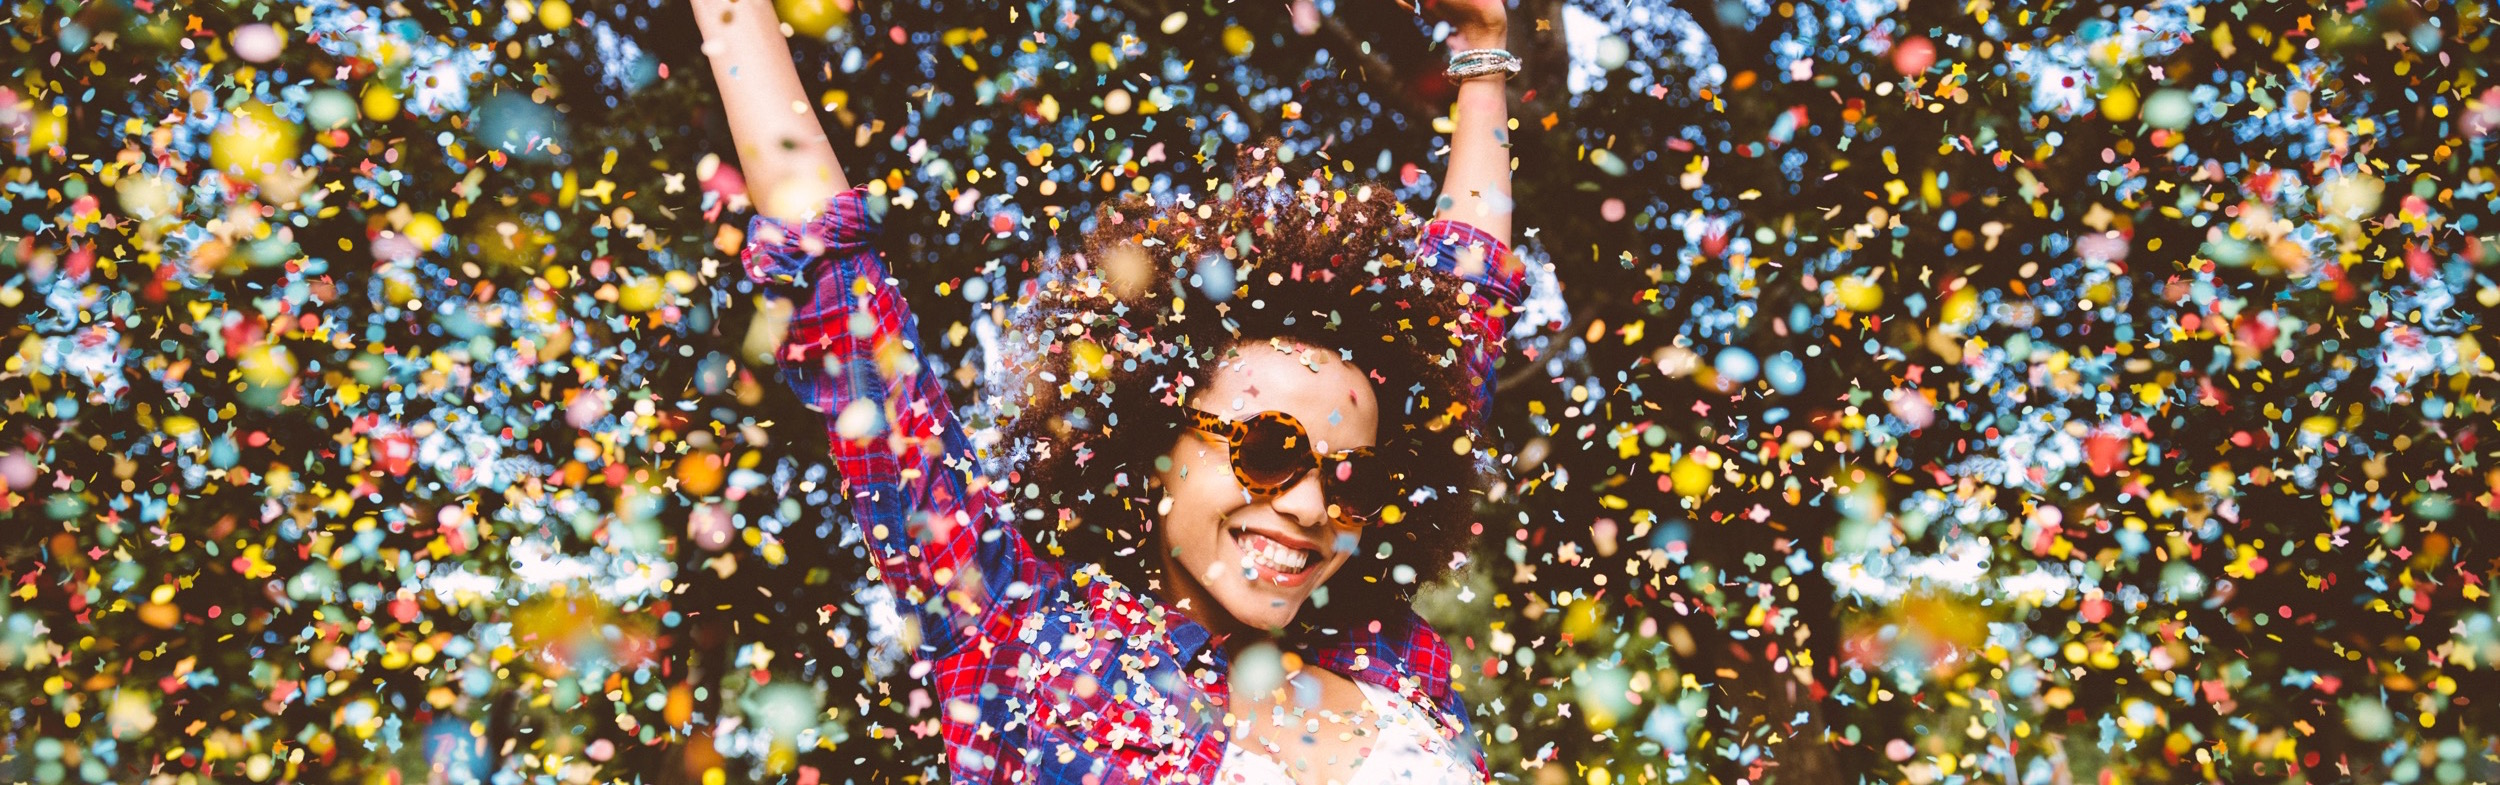 celebration girl